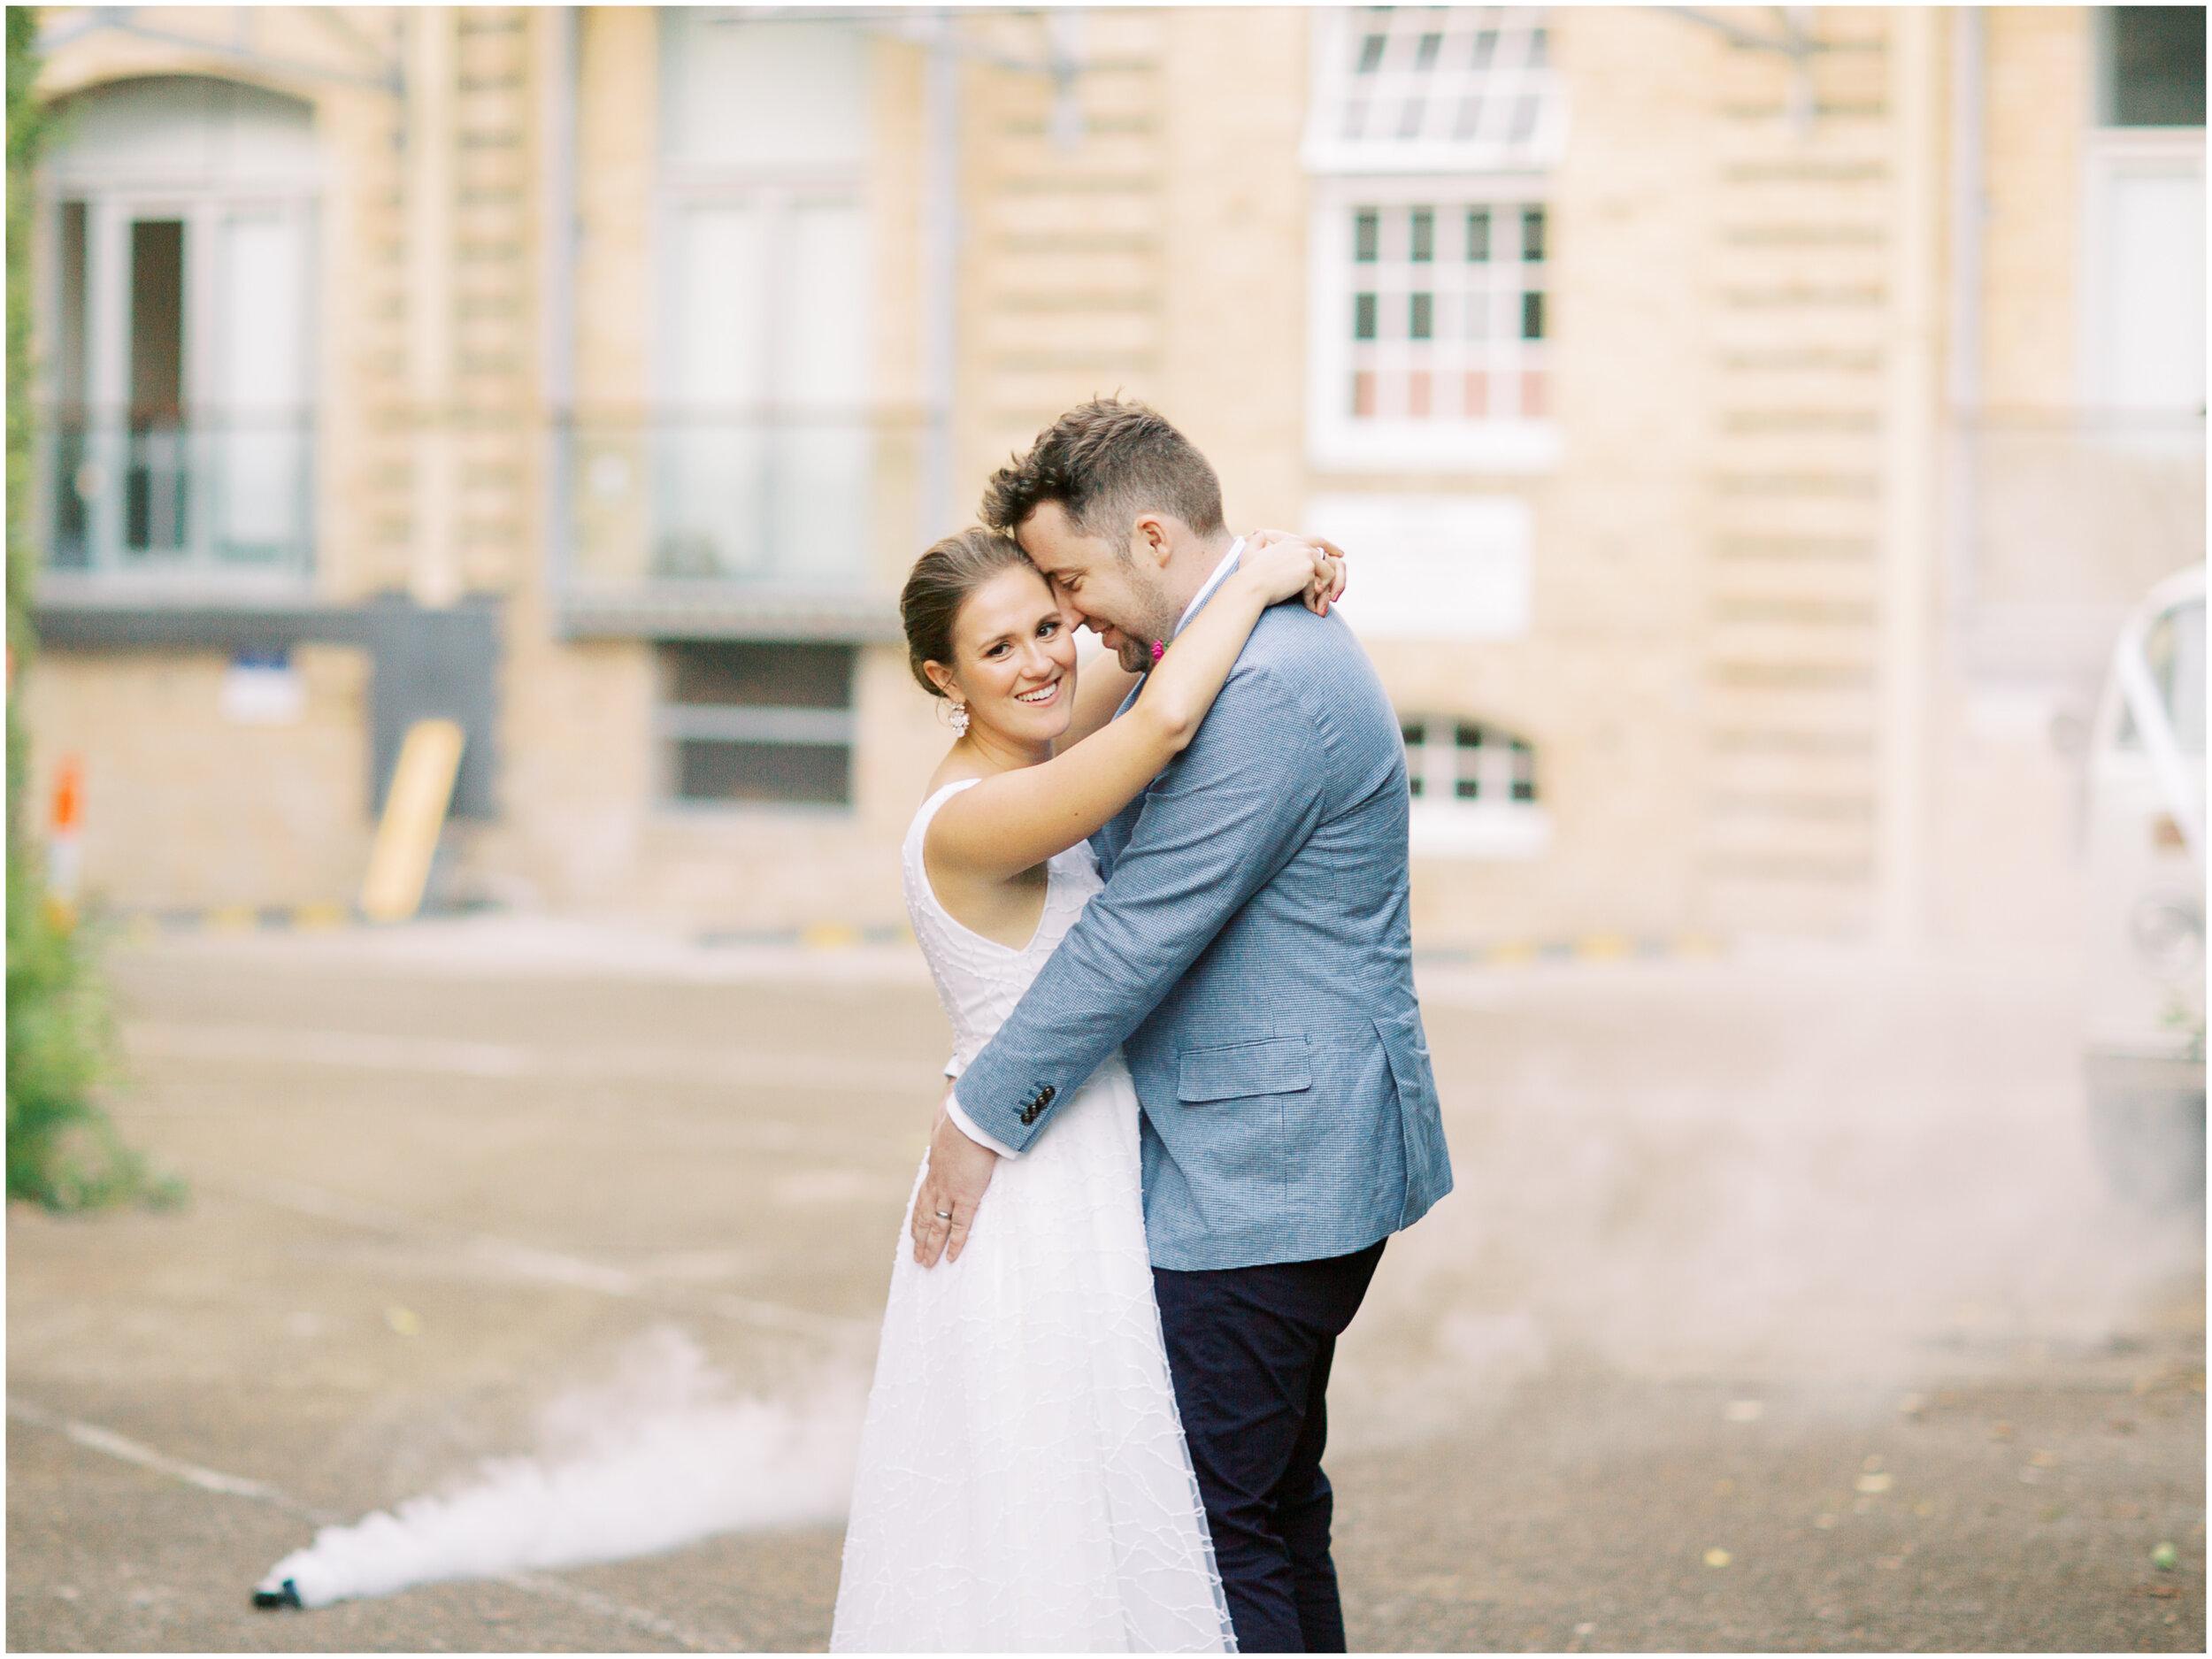 fine-art-australian-destination-wedding-photographer-29.jpg